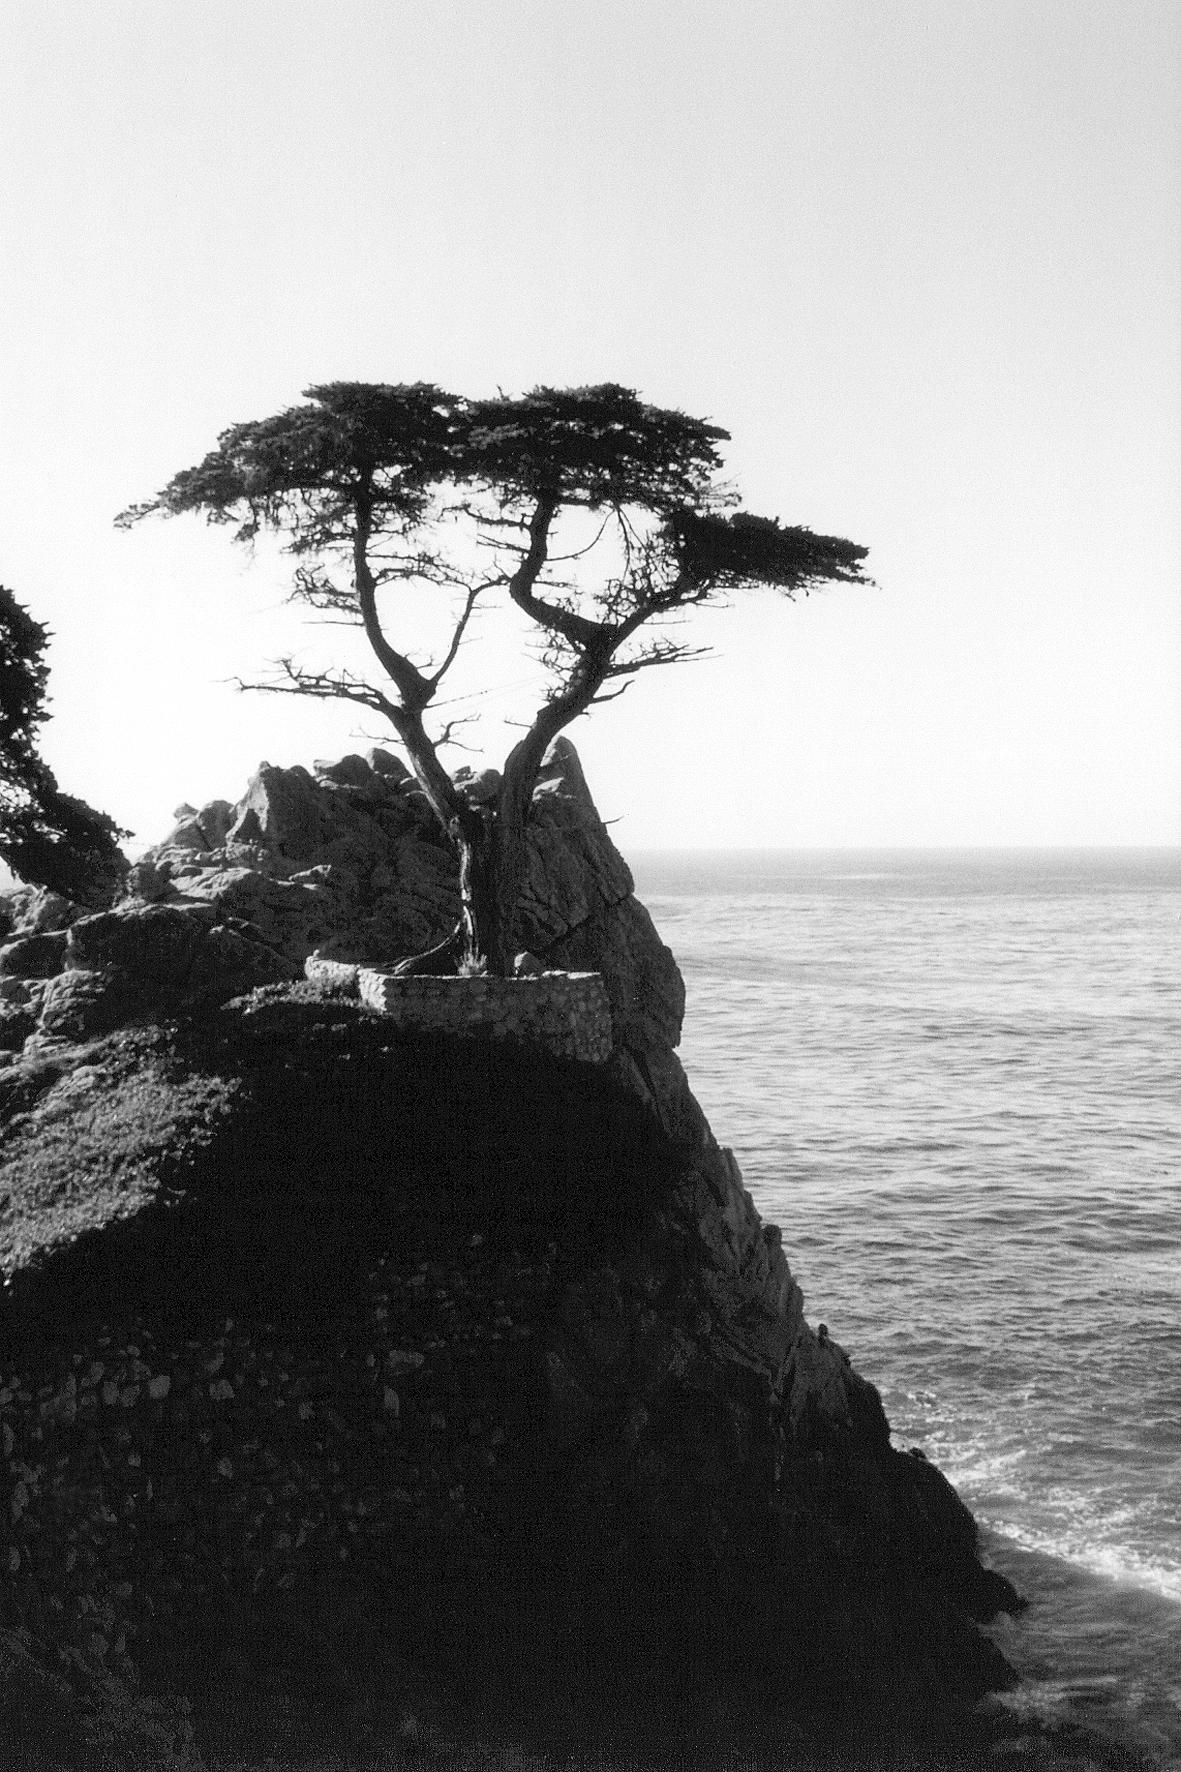 Monterey 17 mile 05pb.jp